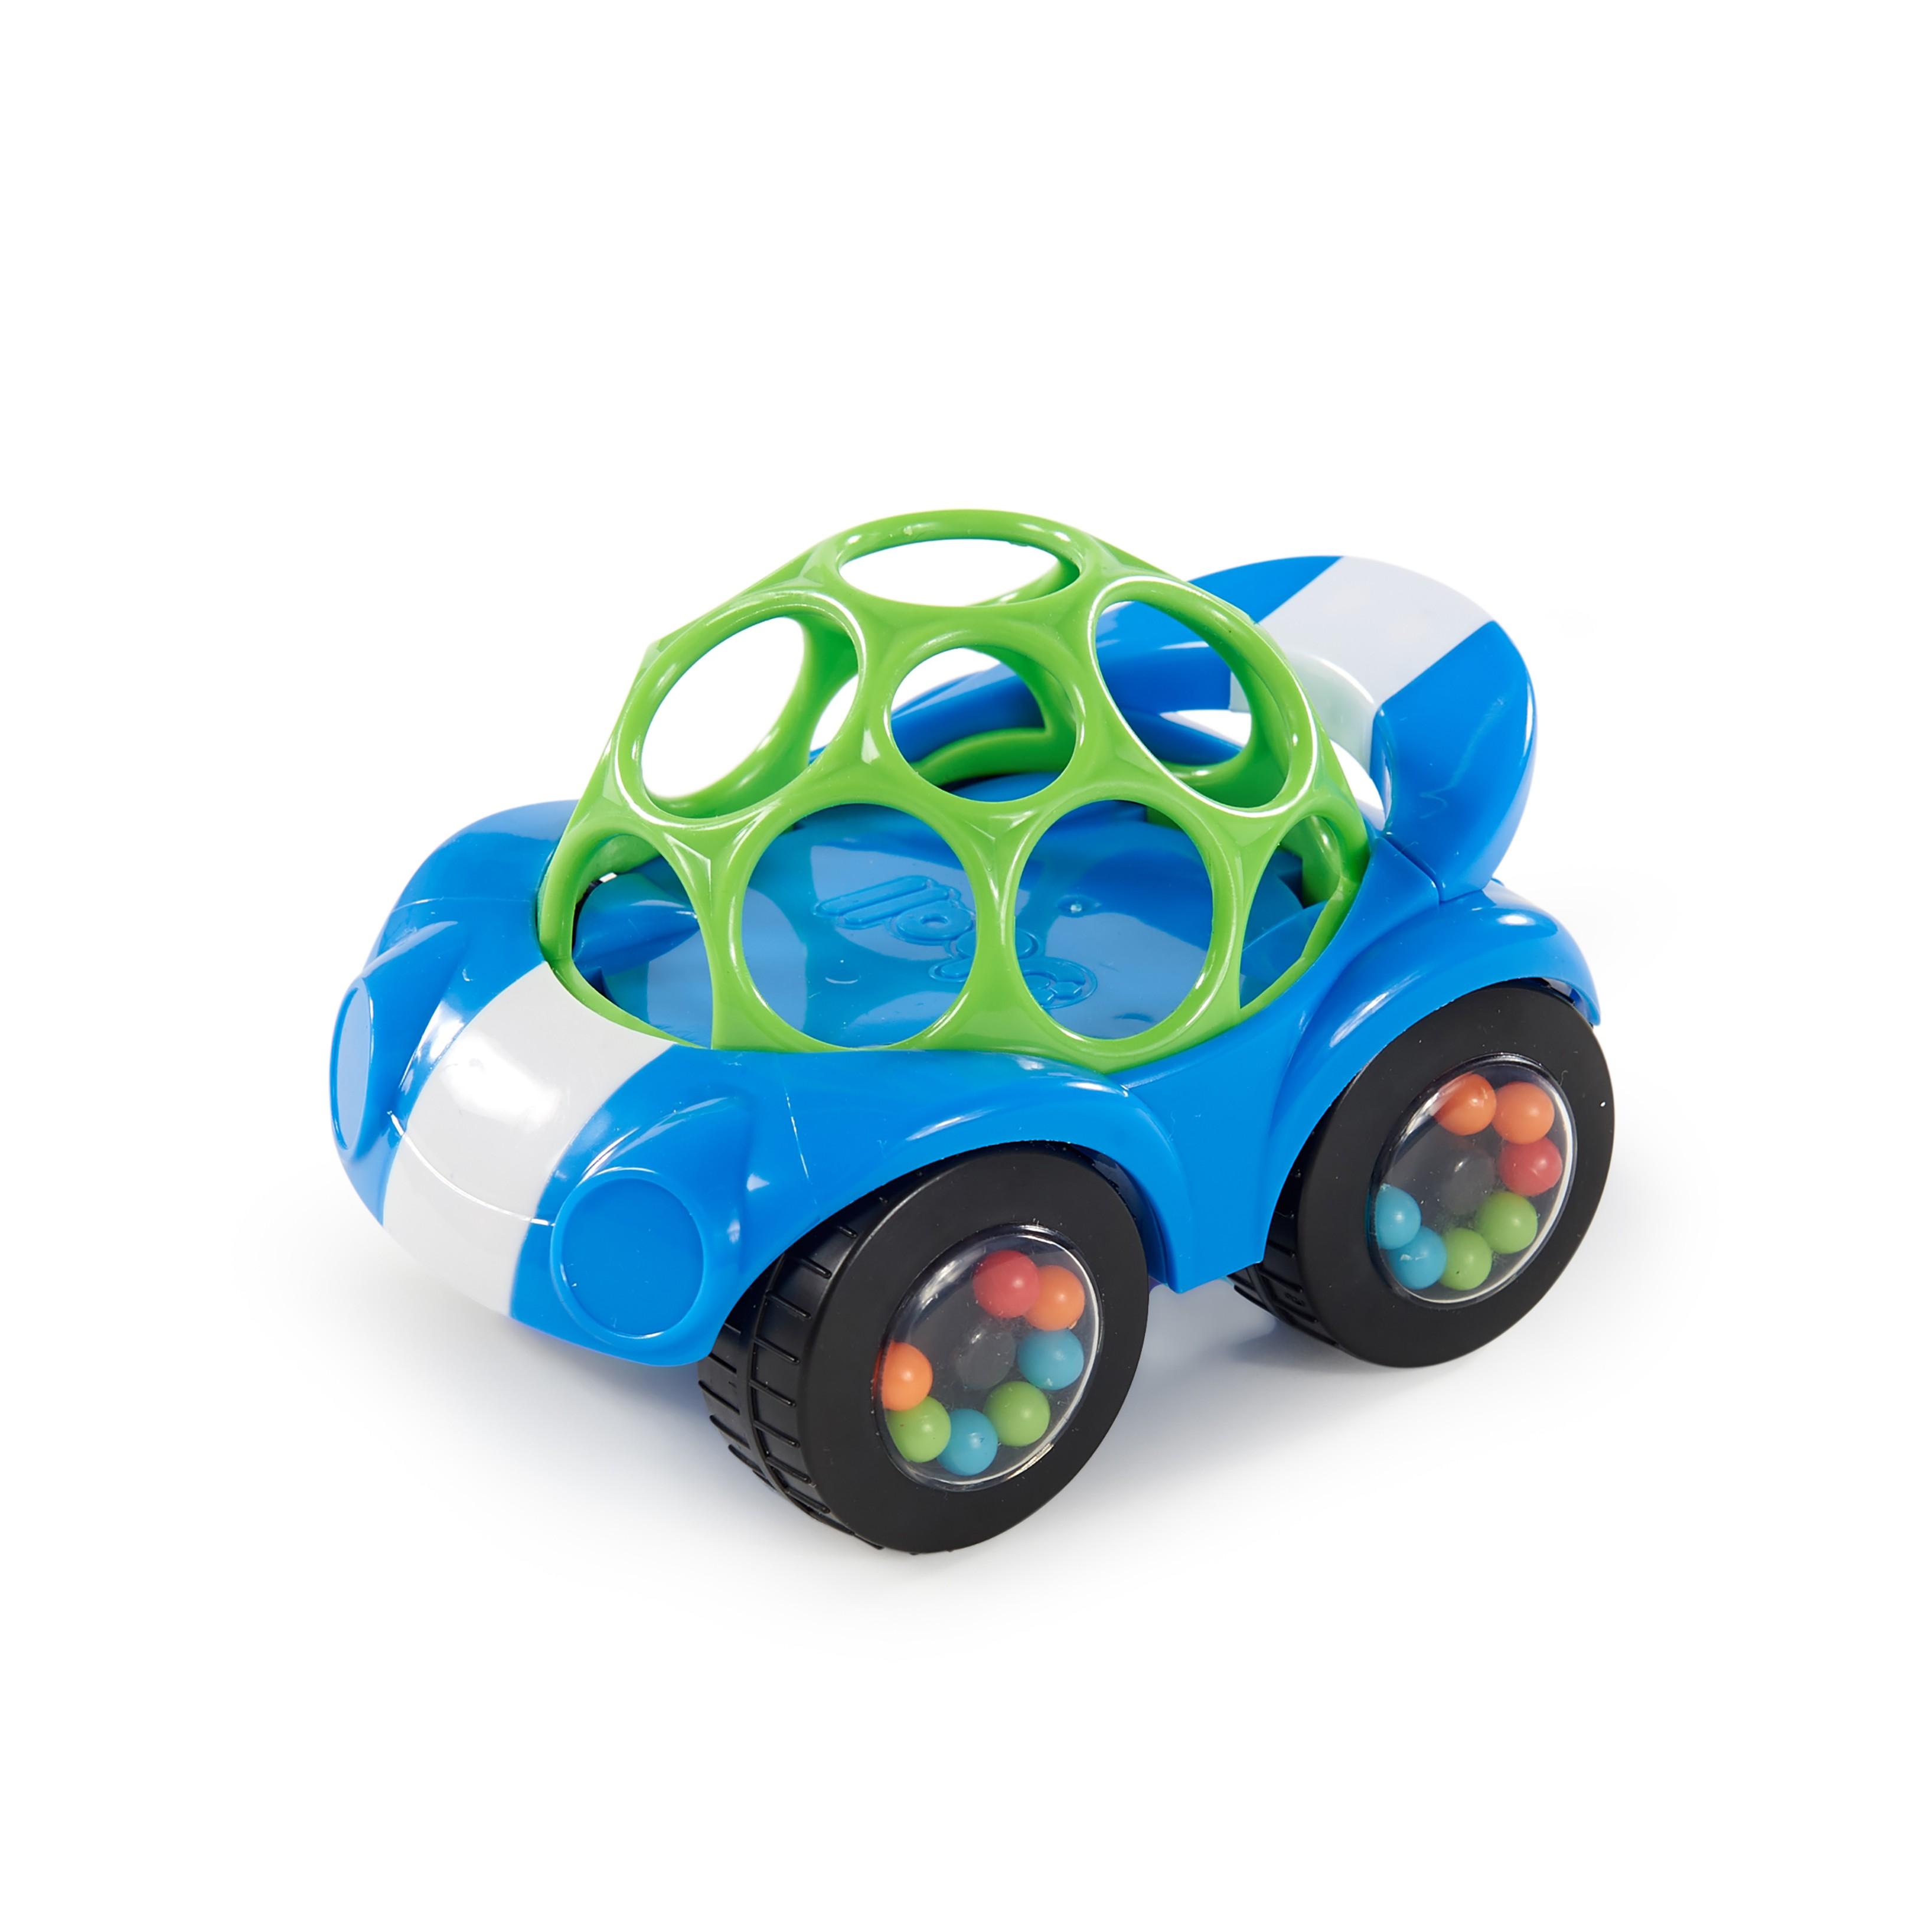 Hračka autíčko Rattle&Roll Oball™ modro/zelené 3m+